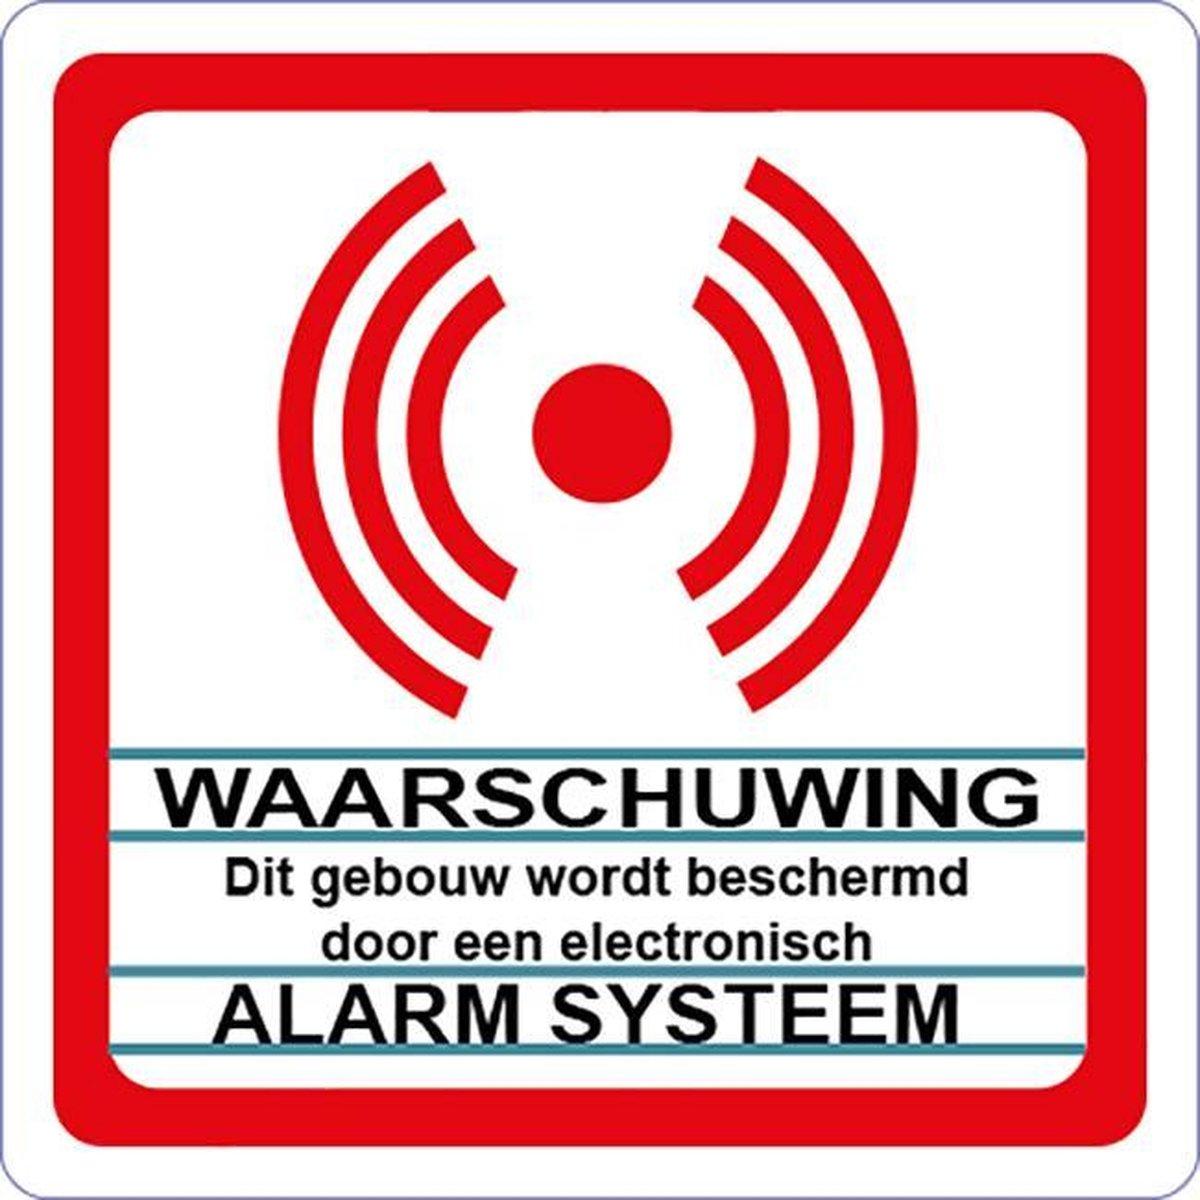 Beveiligingsstickers. Alarm Systeem sticker. 12 stickers wit. ( achterkant plakt. ) 8 cm x 8 cm. - Promessa-Design